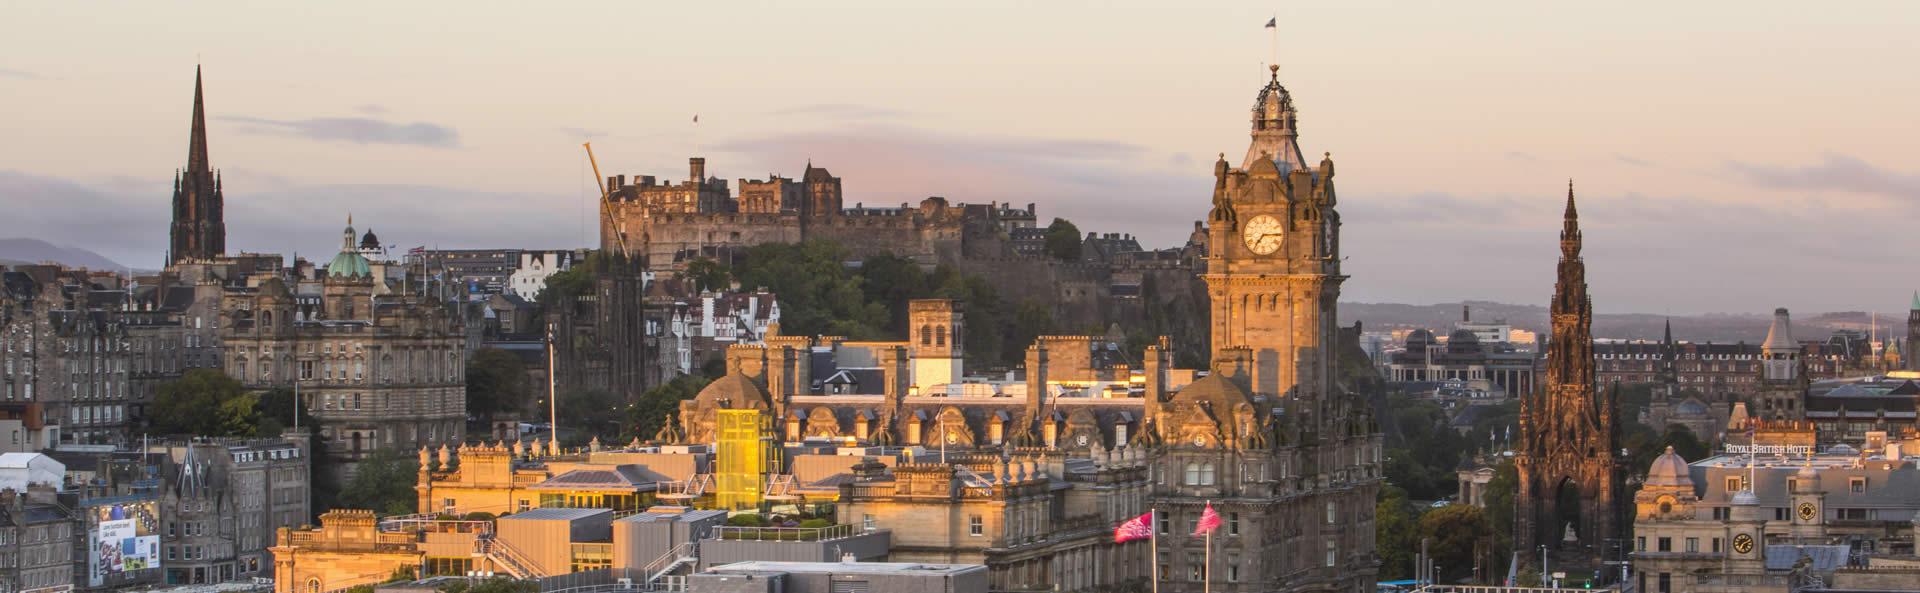 The University of Edinburgh Business School